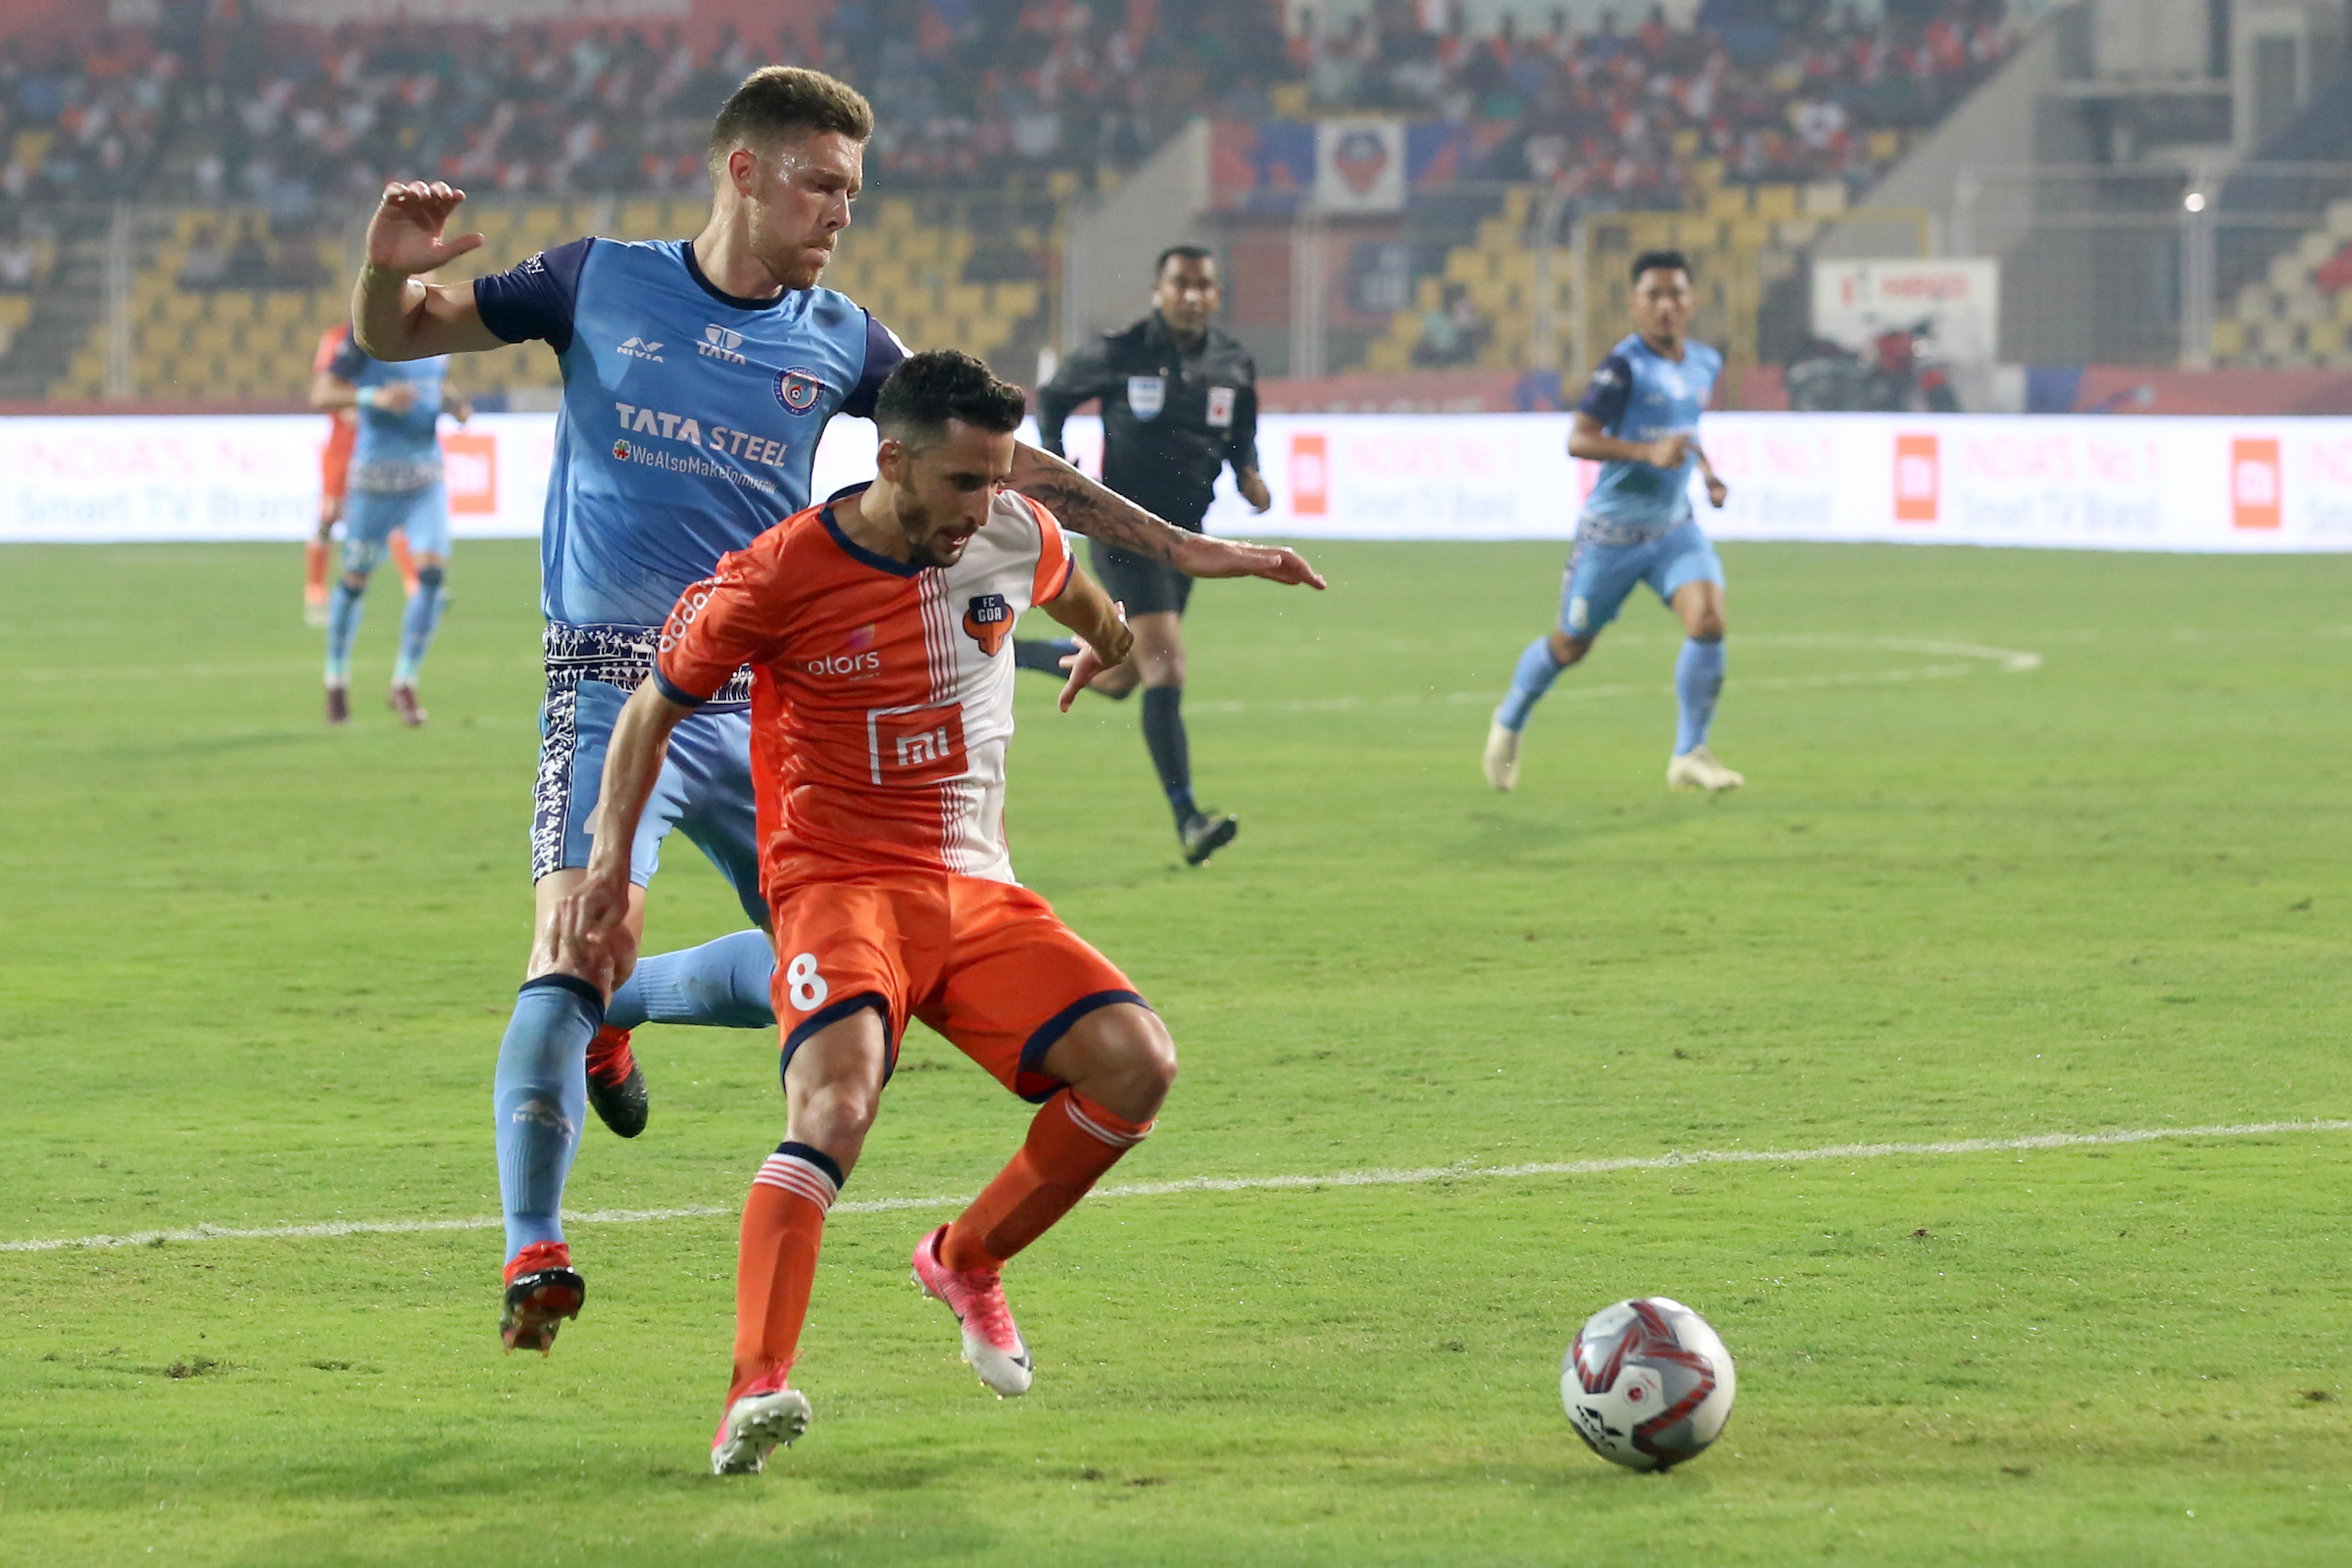 FC Goa v Jamshedpur FC, Indian Super League